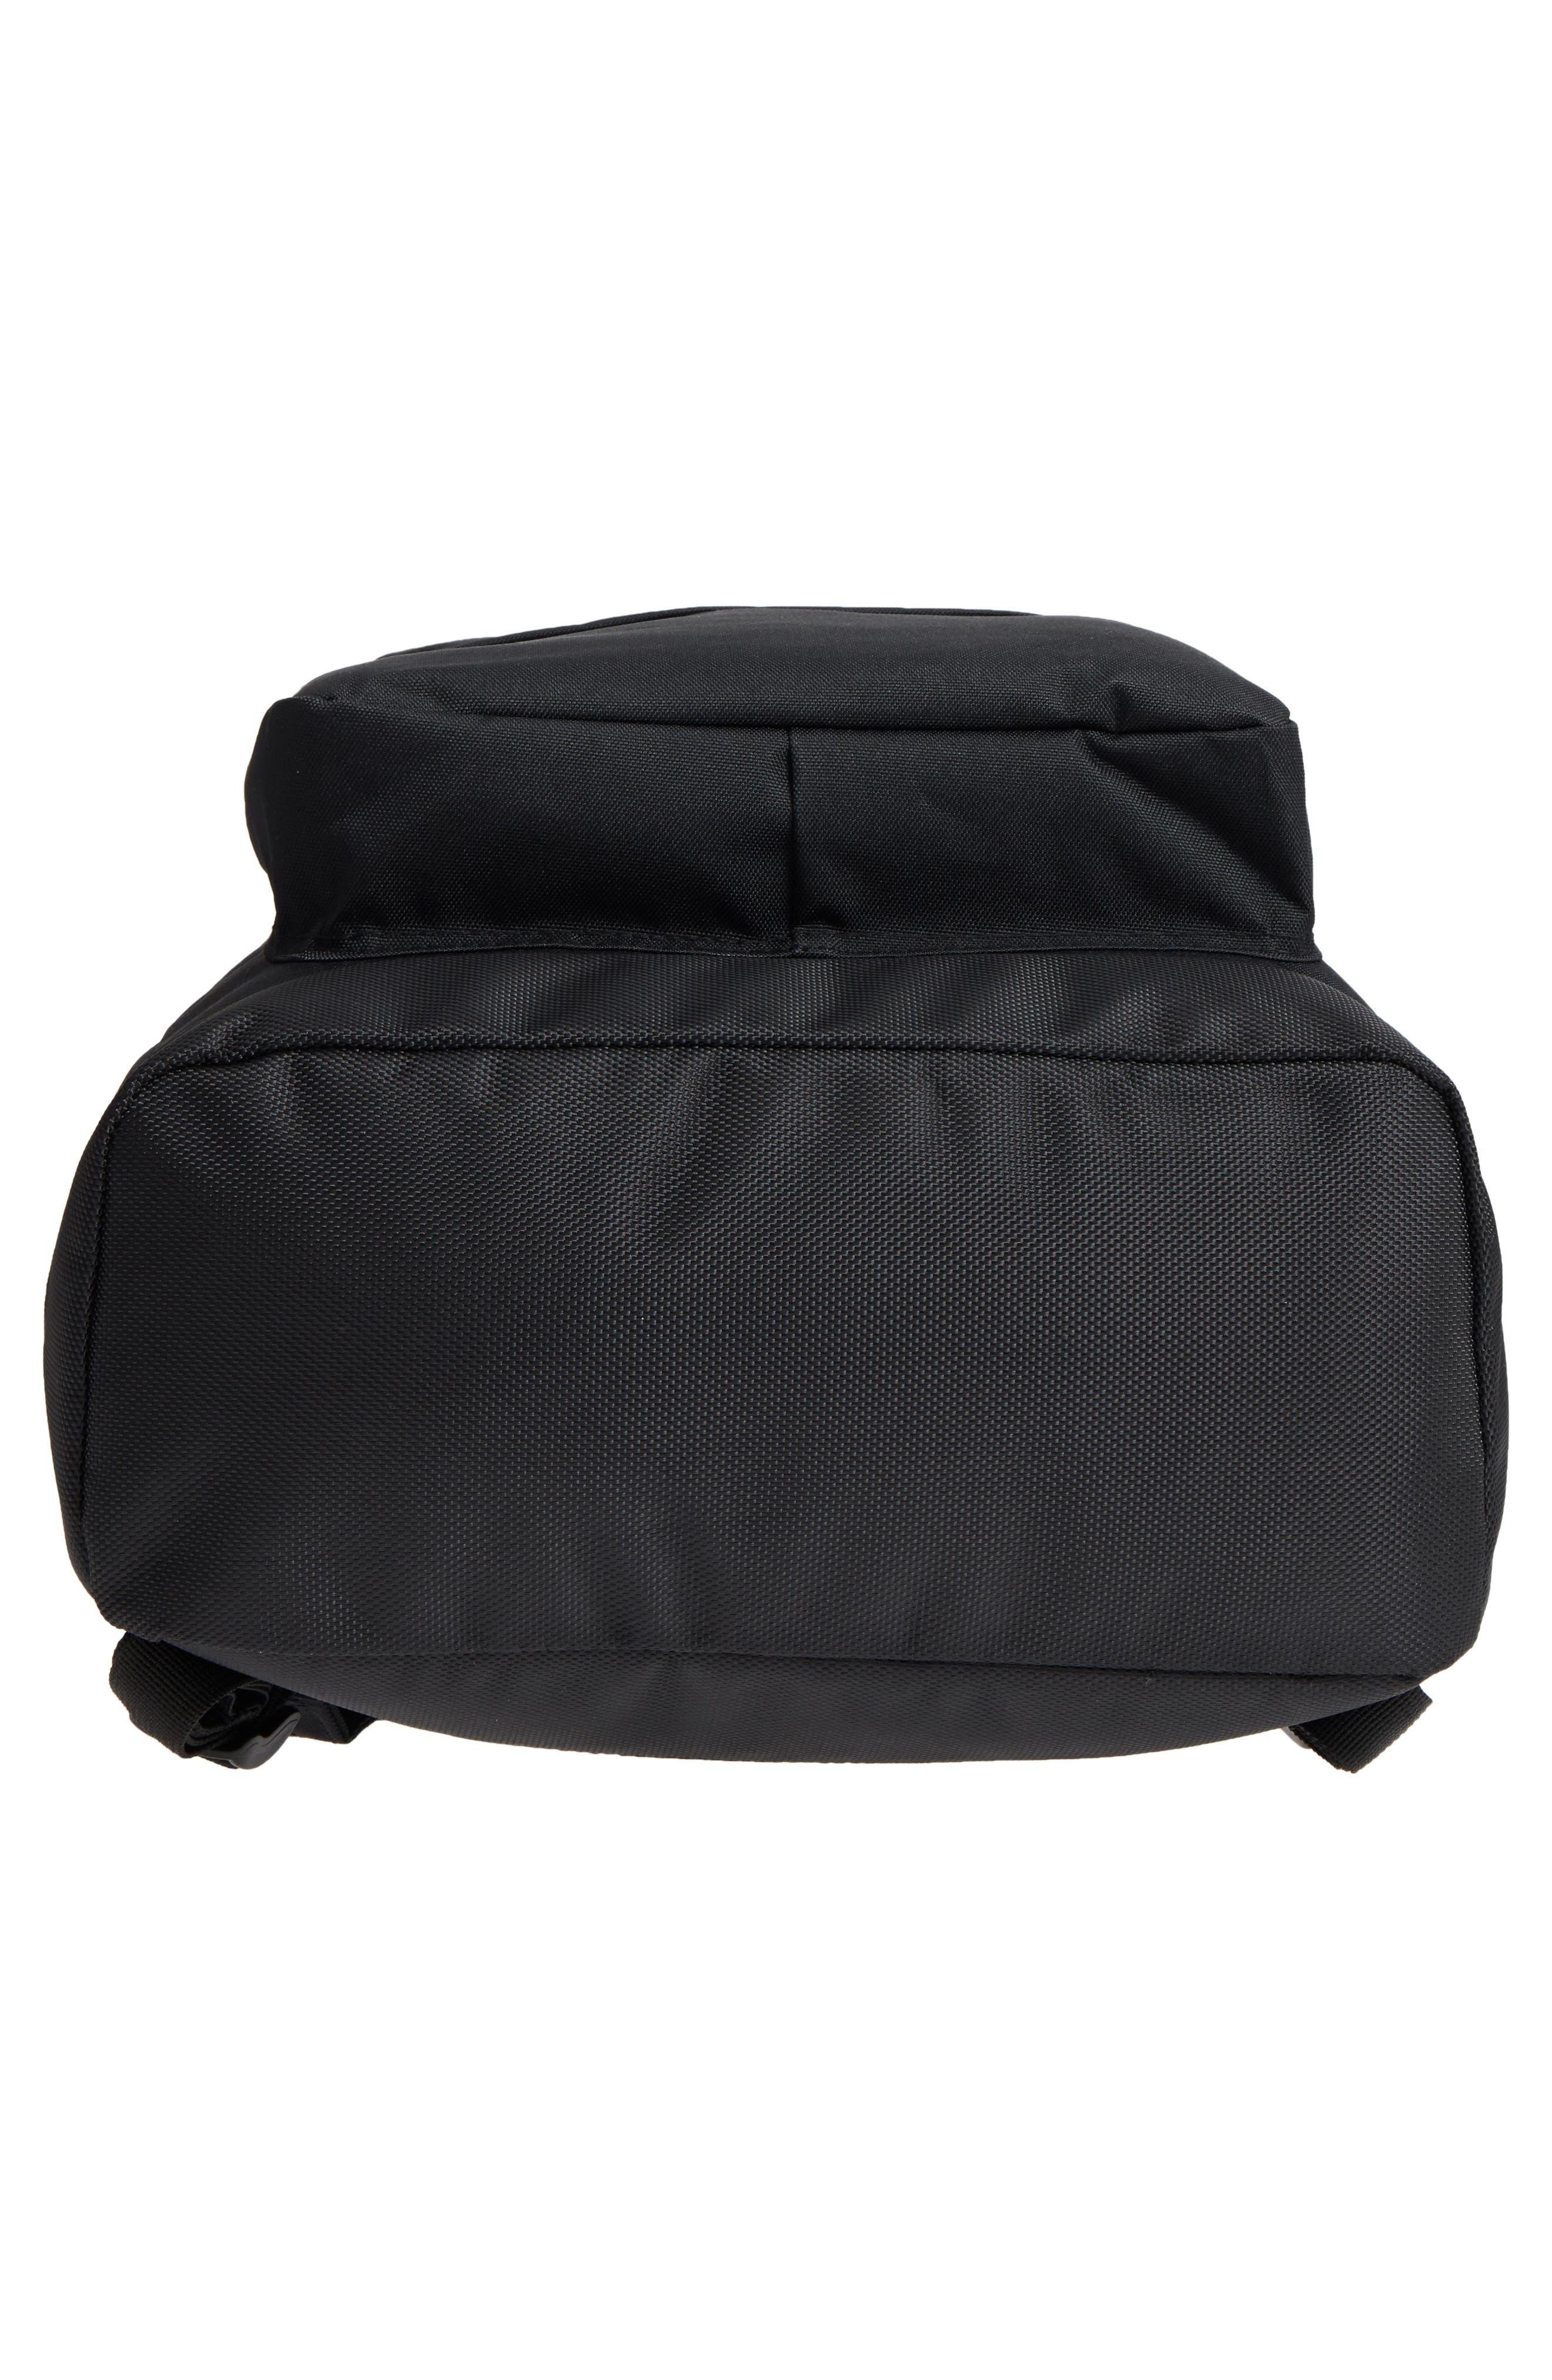 Drop Out Juvee Backpack,                             Alternate thumbnail 6, color,                             Black